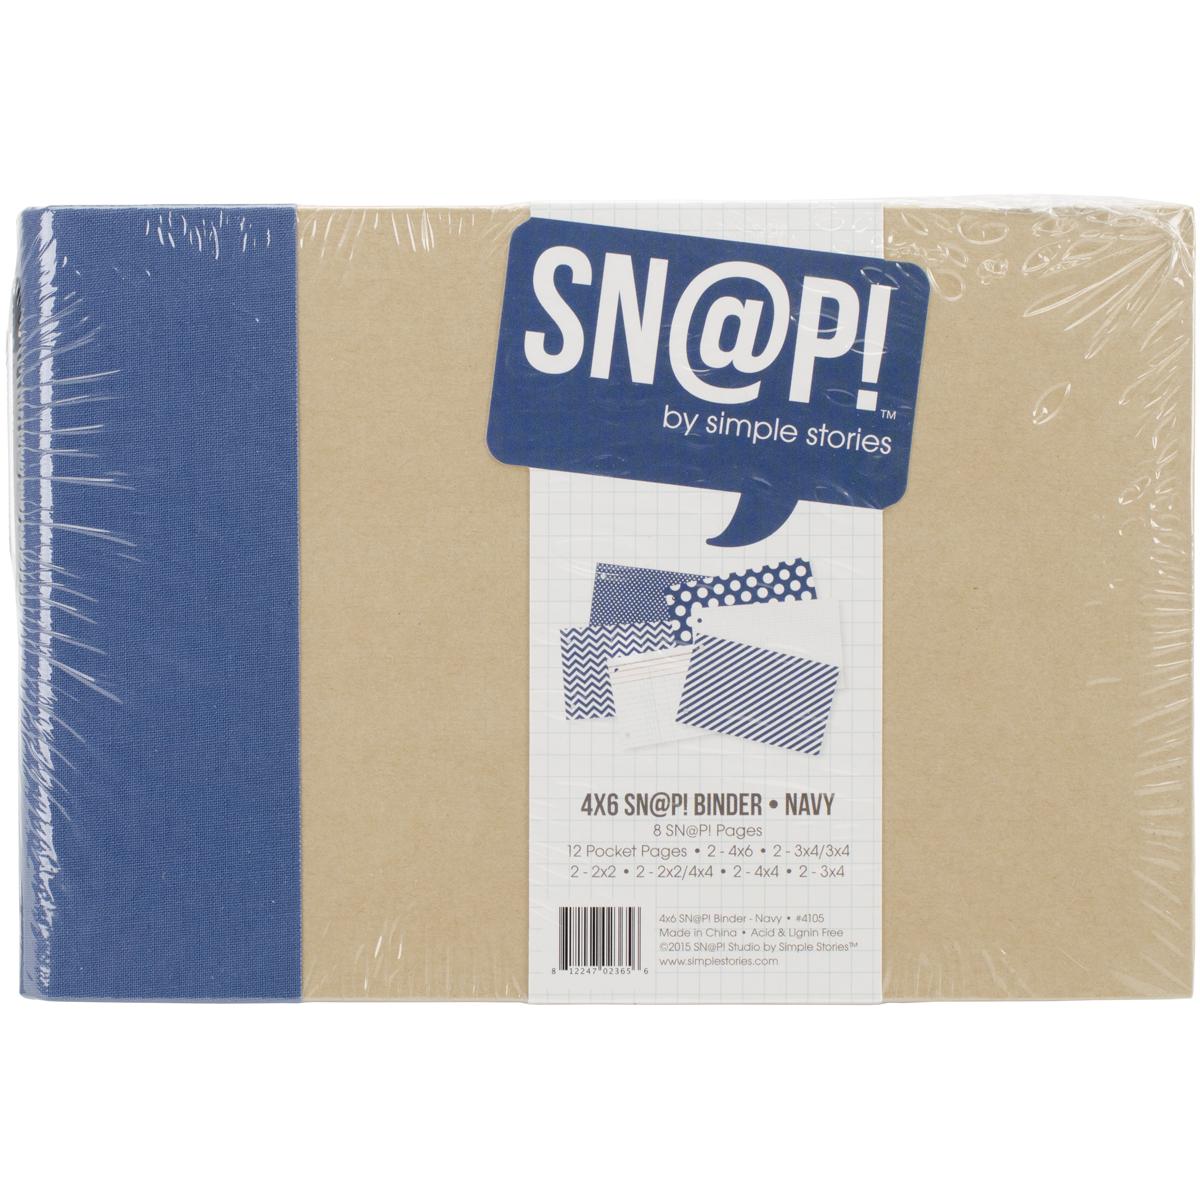 Simple Stories Sn@p! Binder 4X6-Navy